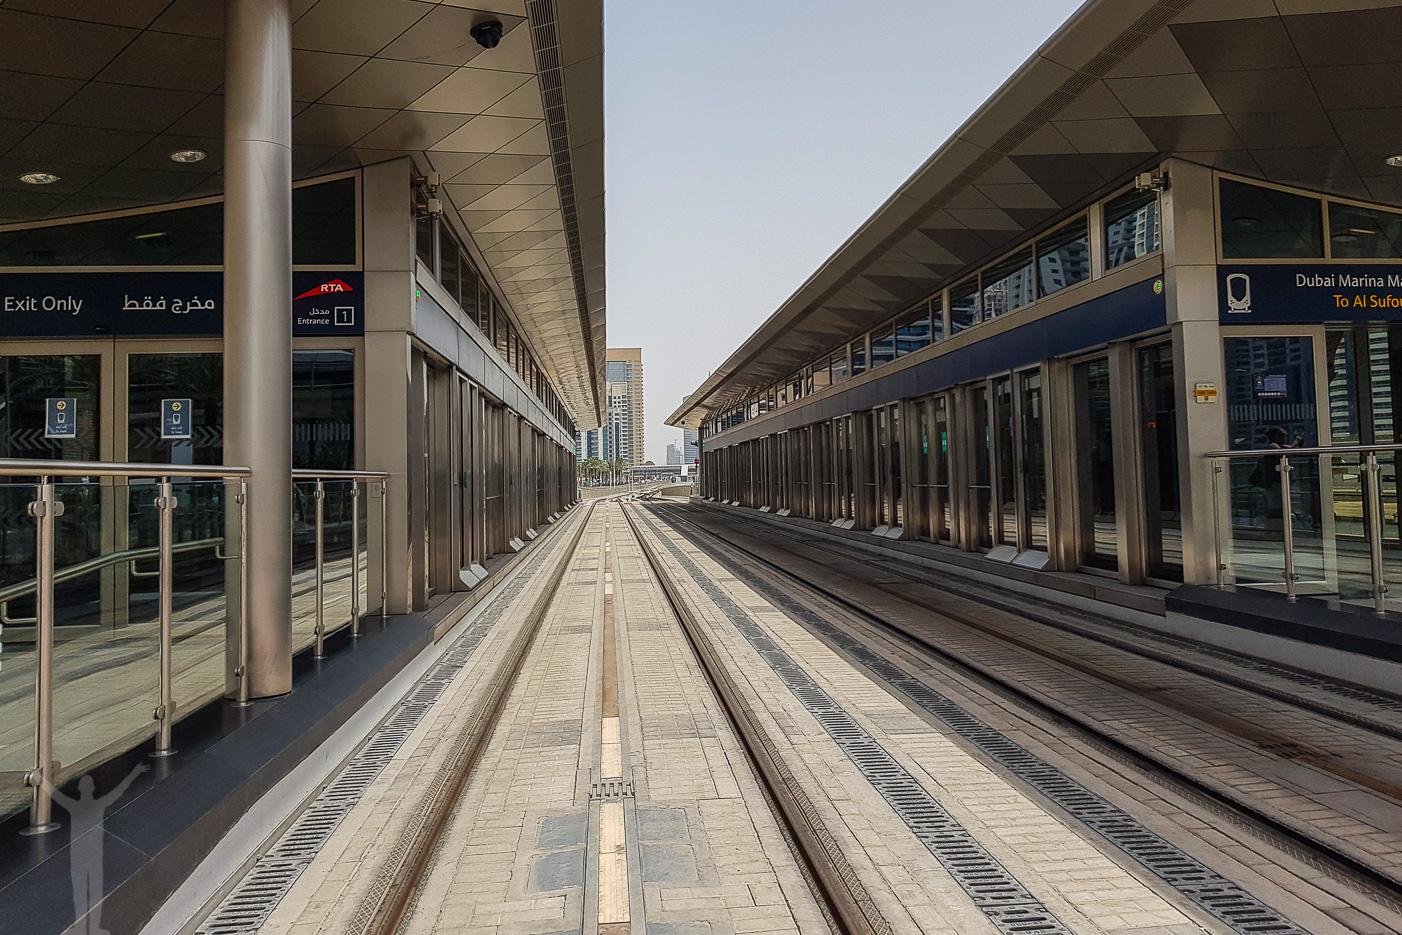 Dubai Tram vid Dubai Marina